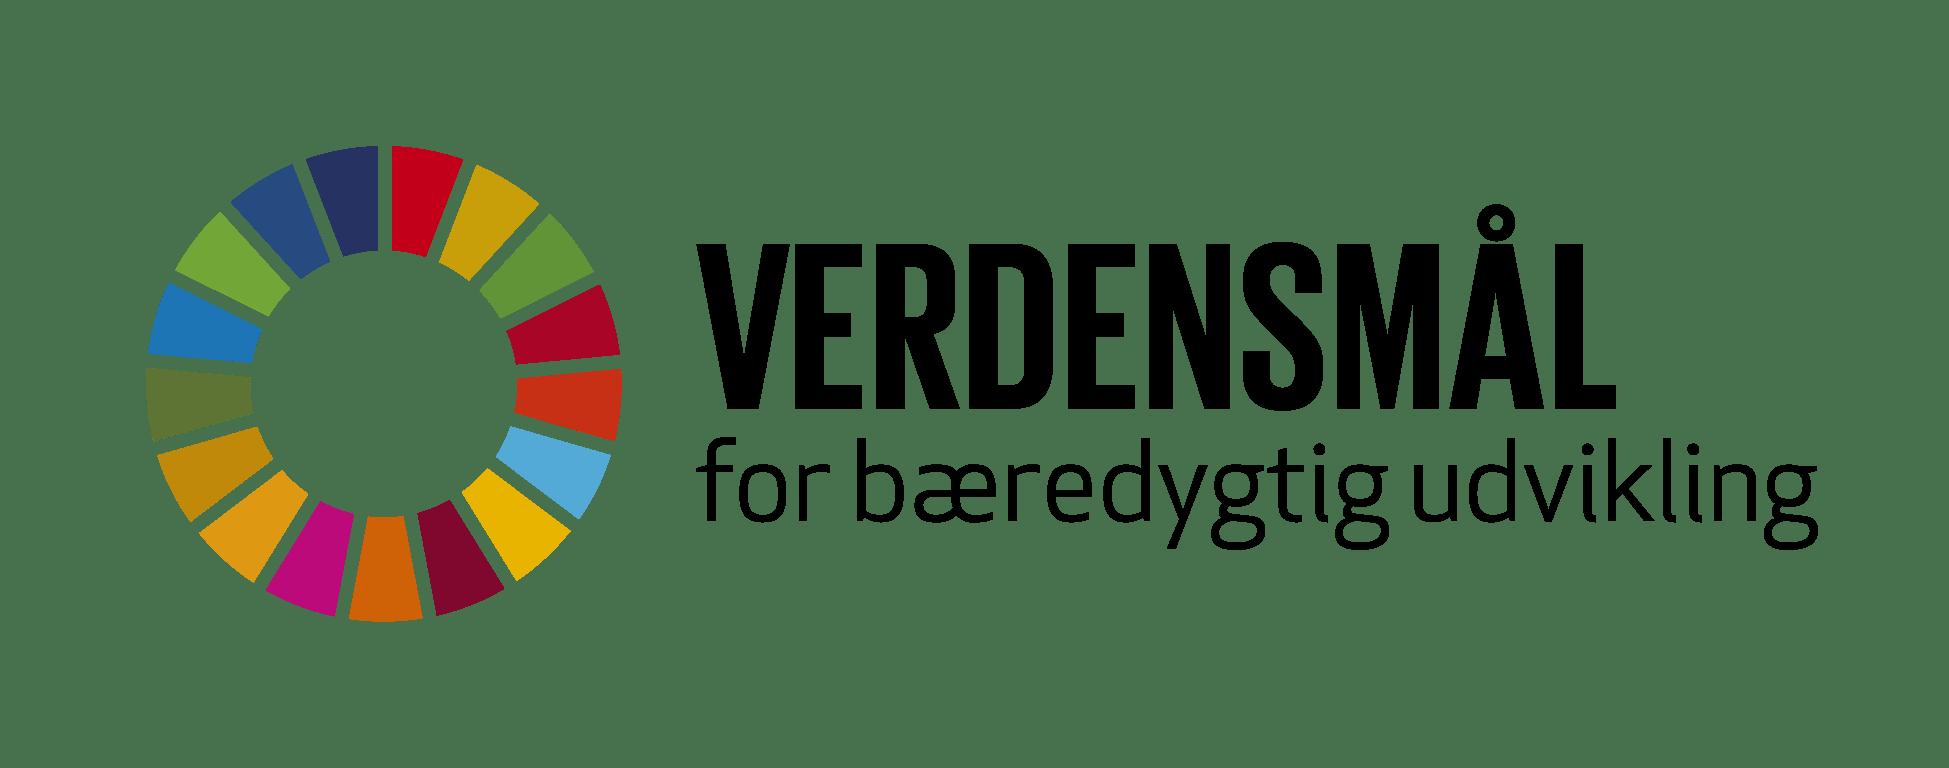 Verdensmål logo